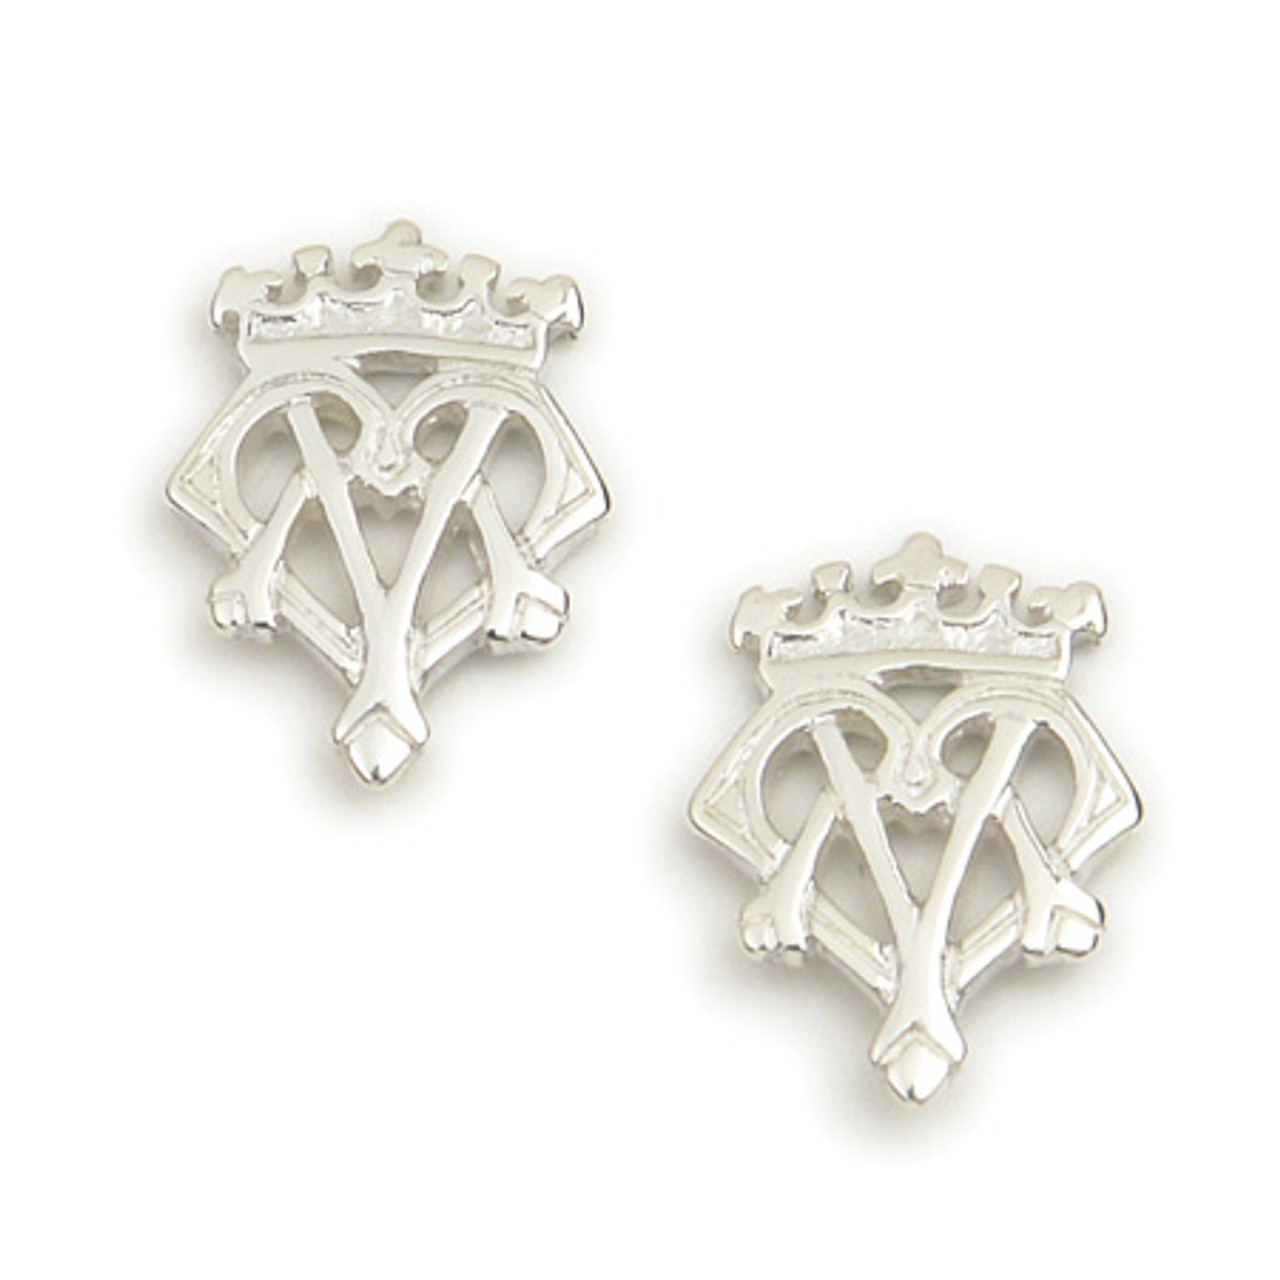 Luckenbooth Earrings